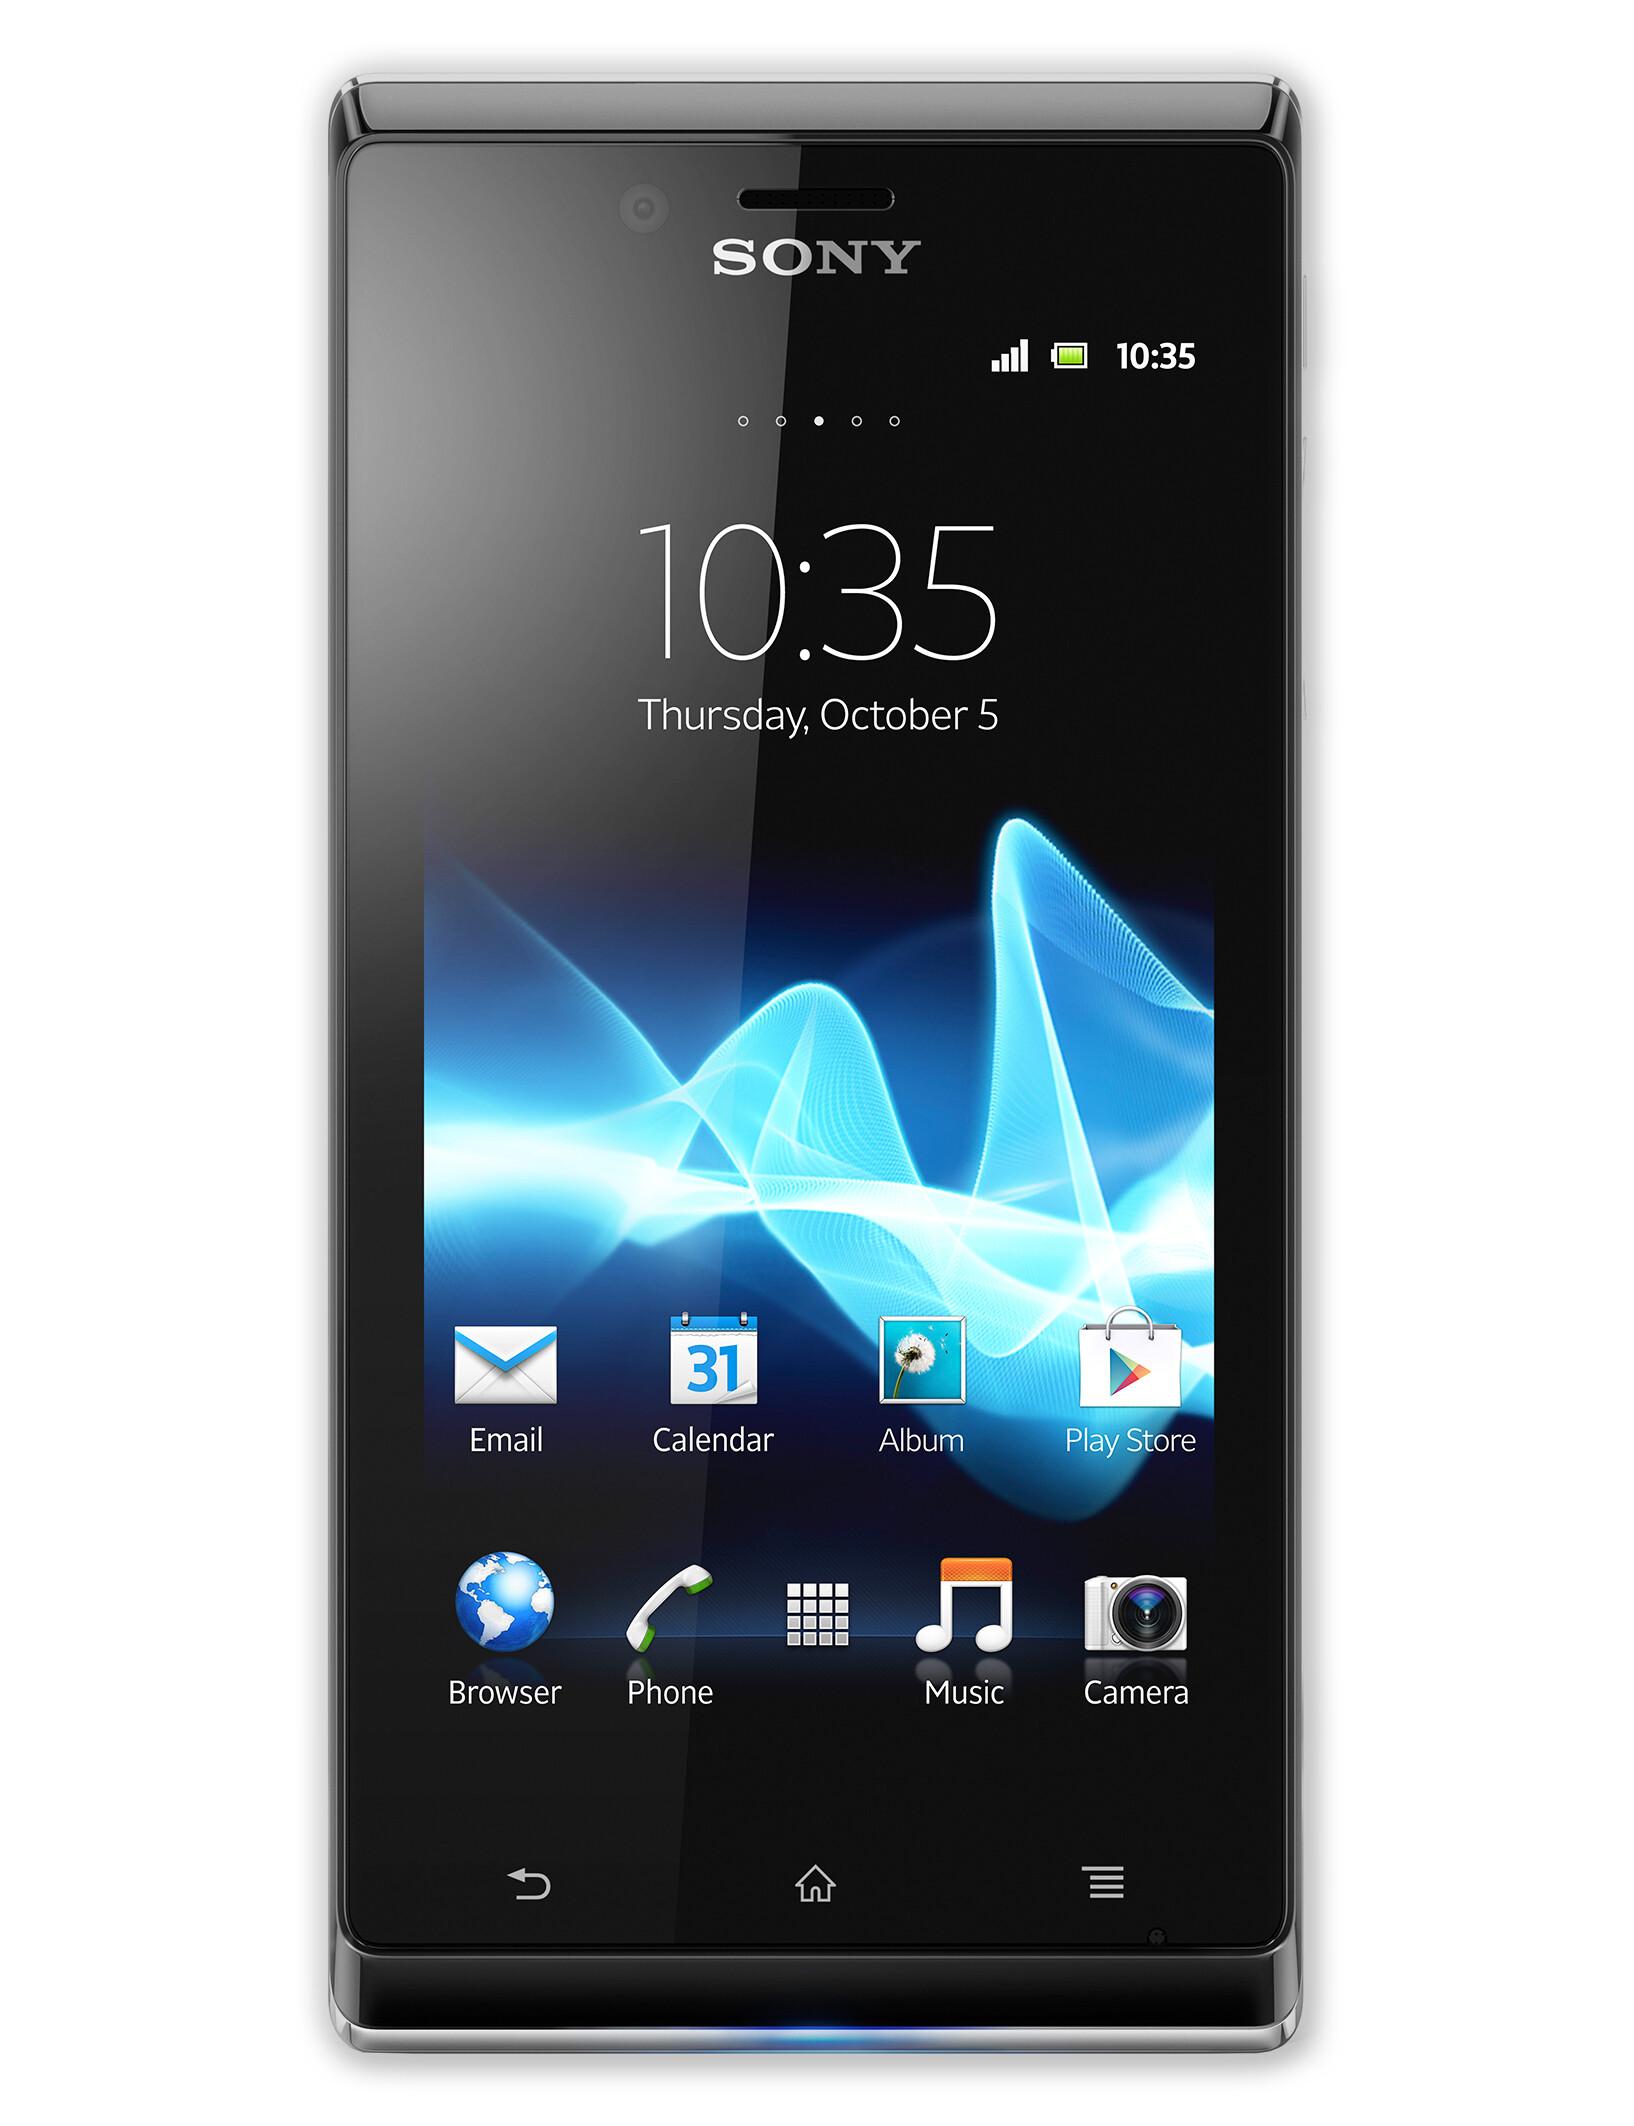 Sony xperia u mobile price in india 2013